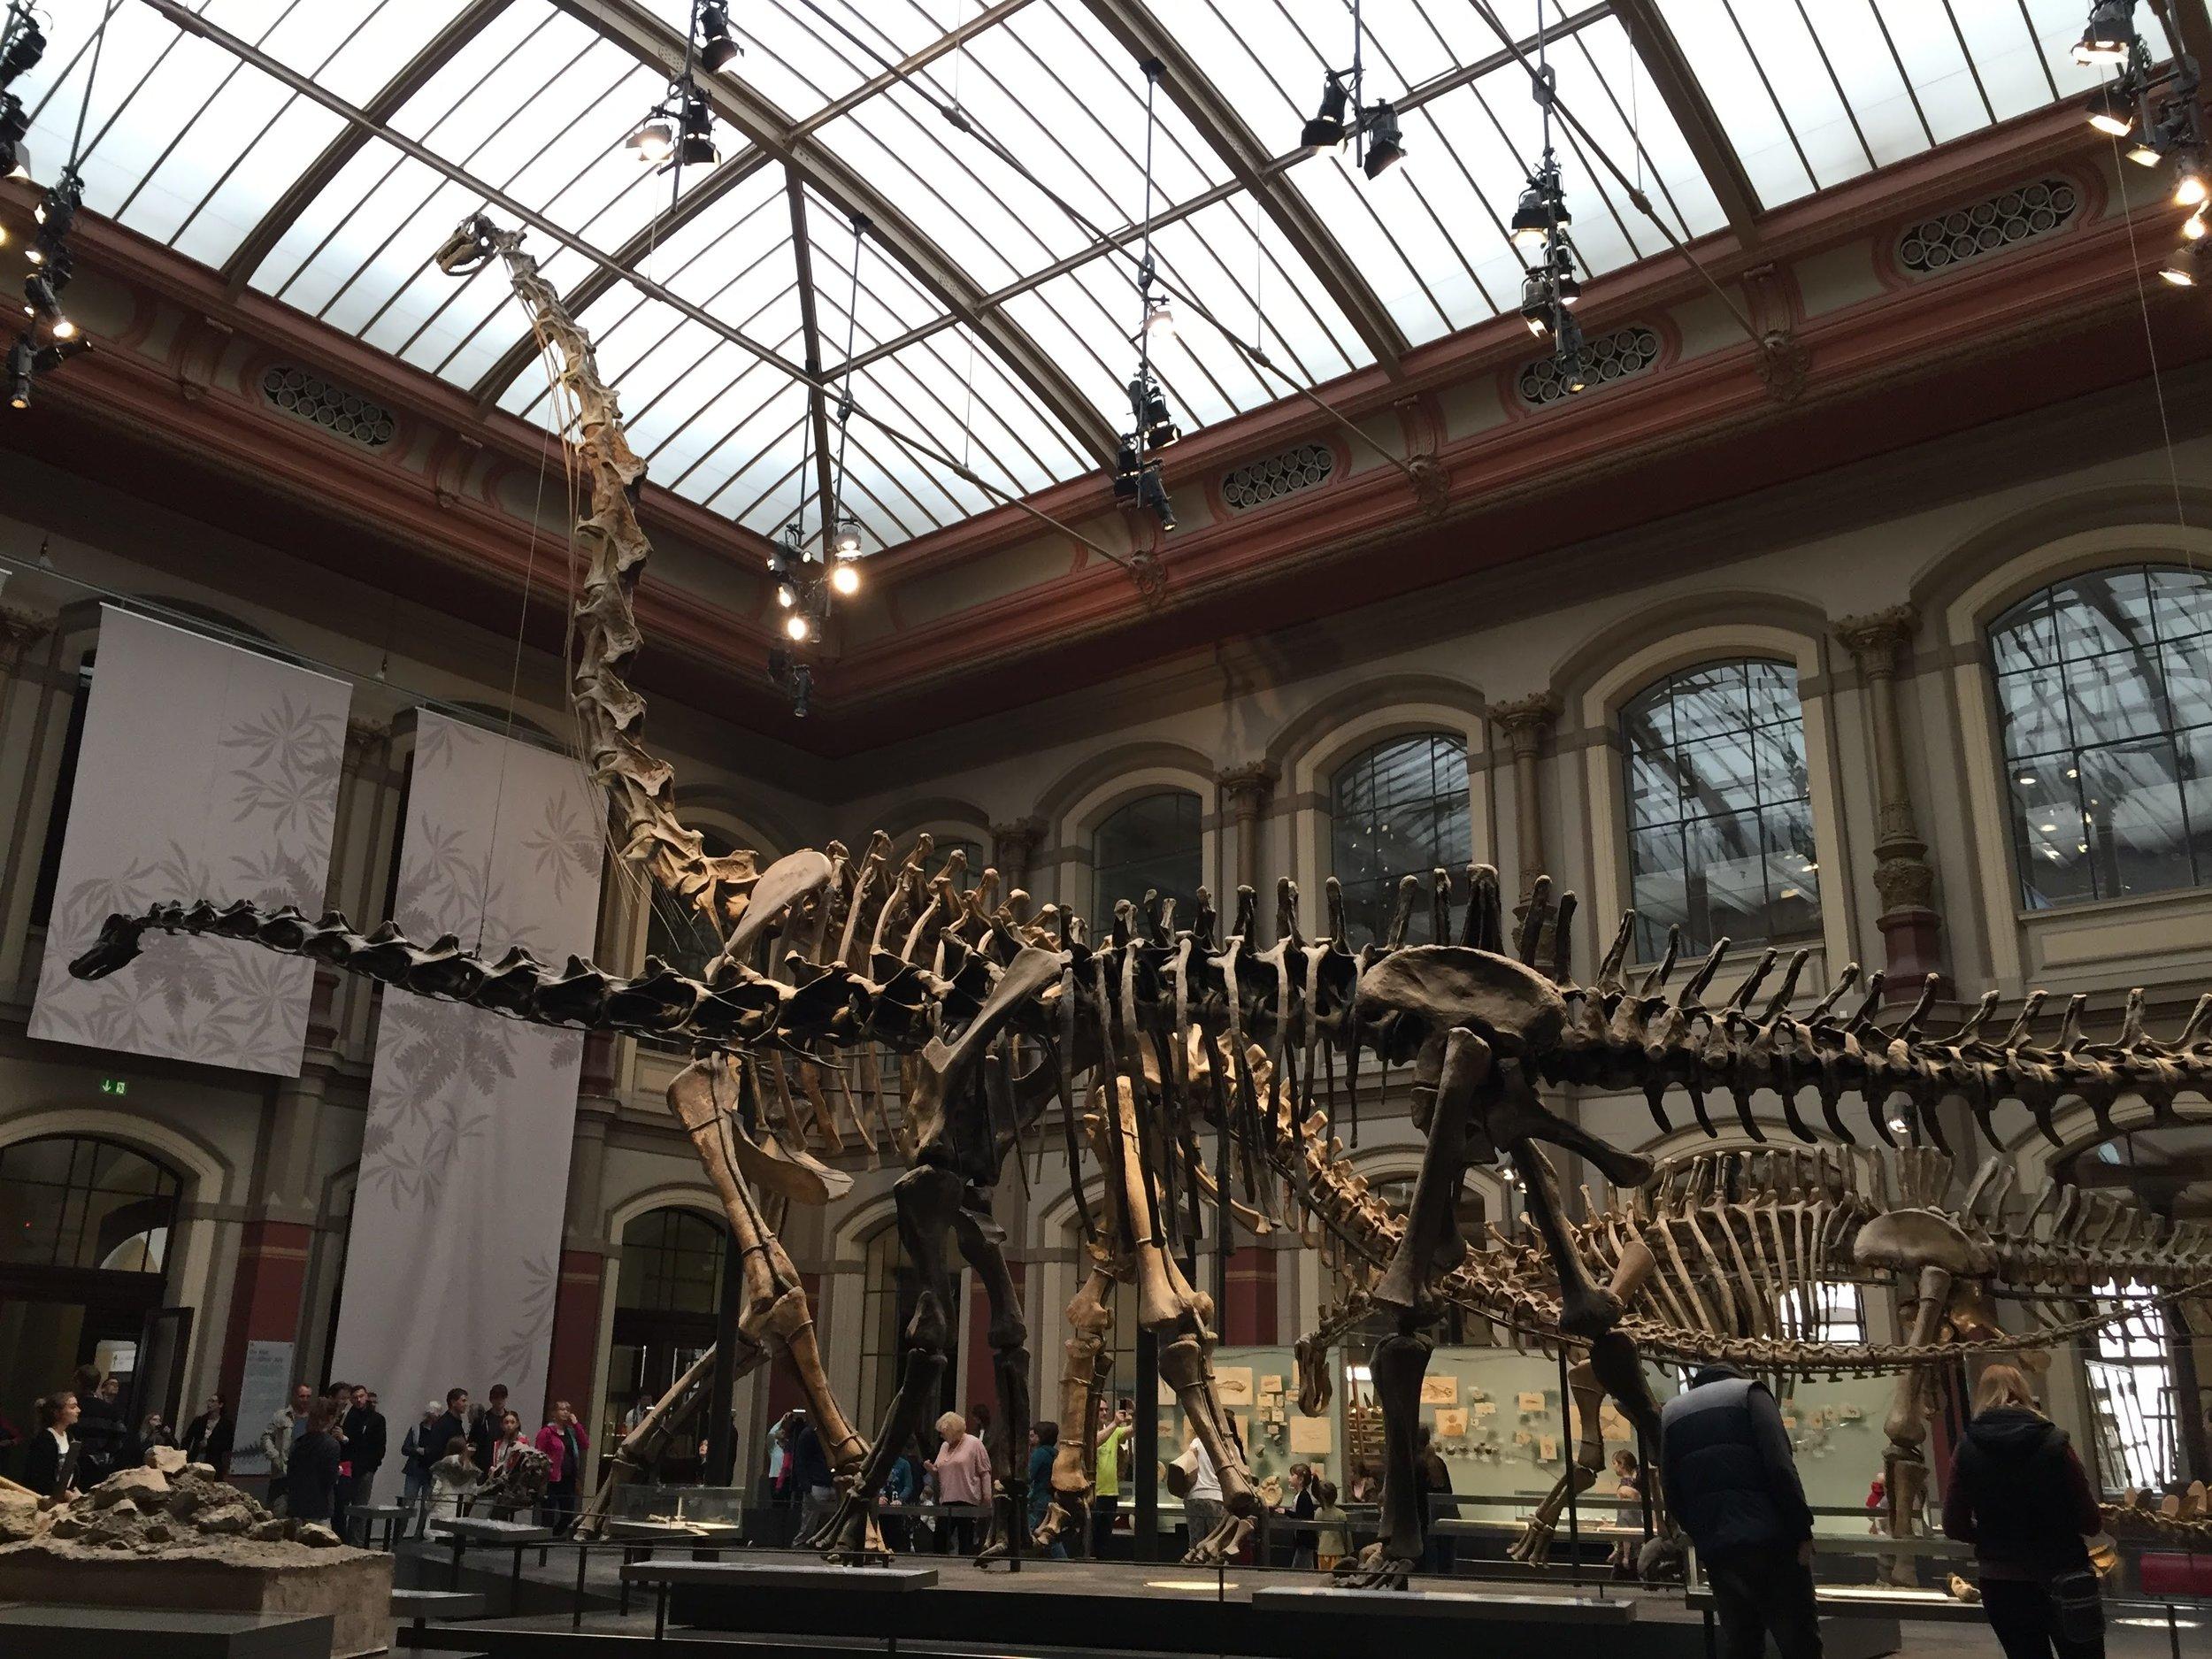 An impressive Brachiosaurus Specimen welcomes you at the entrance